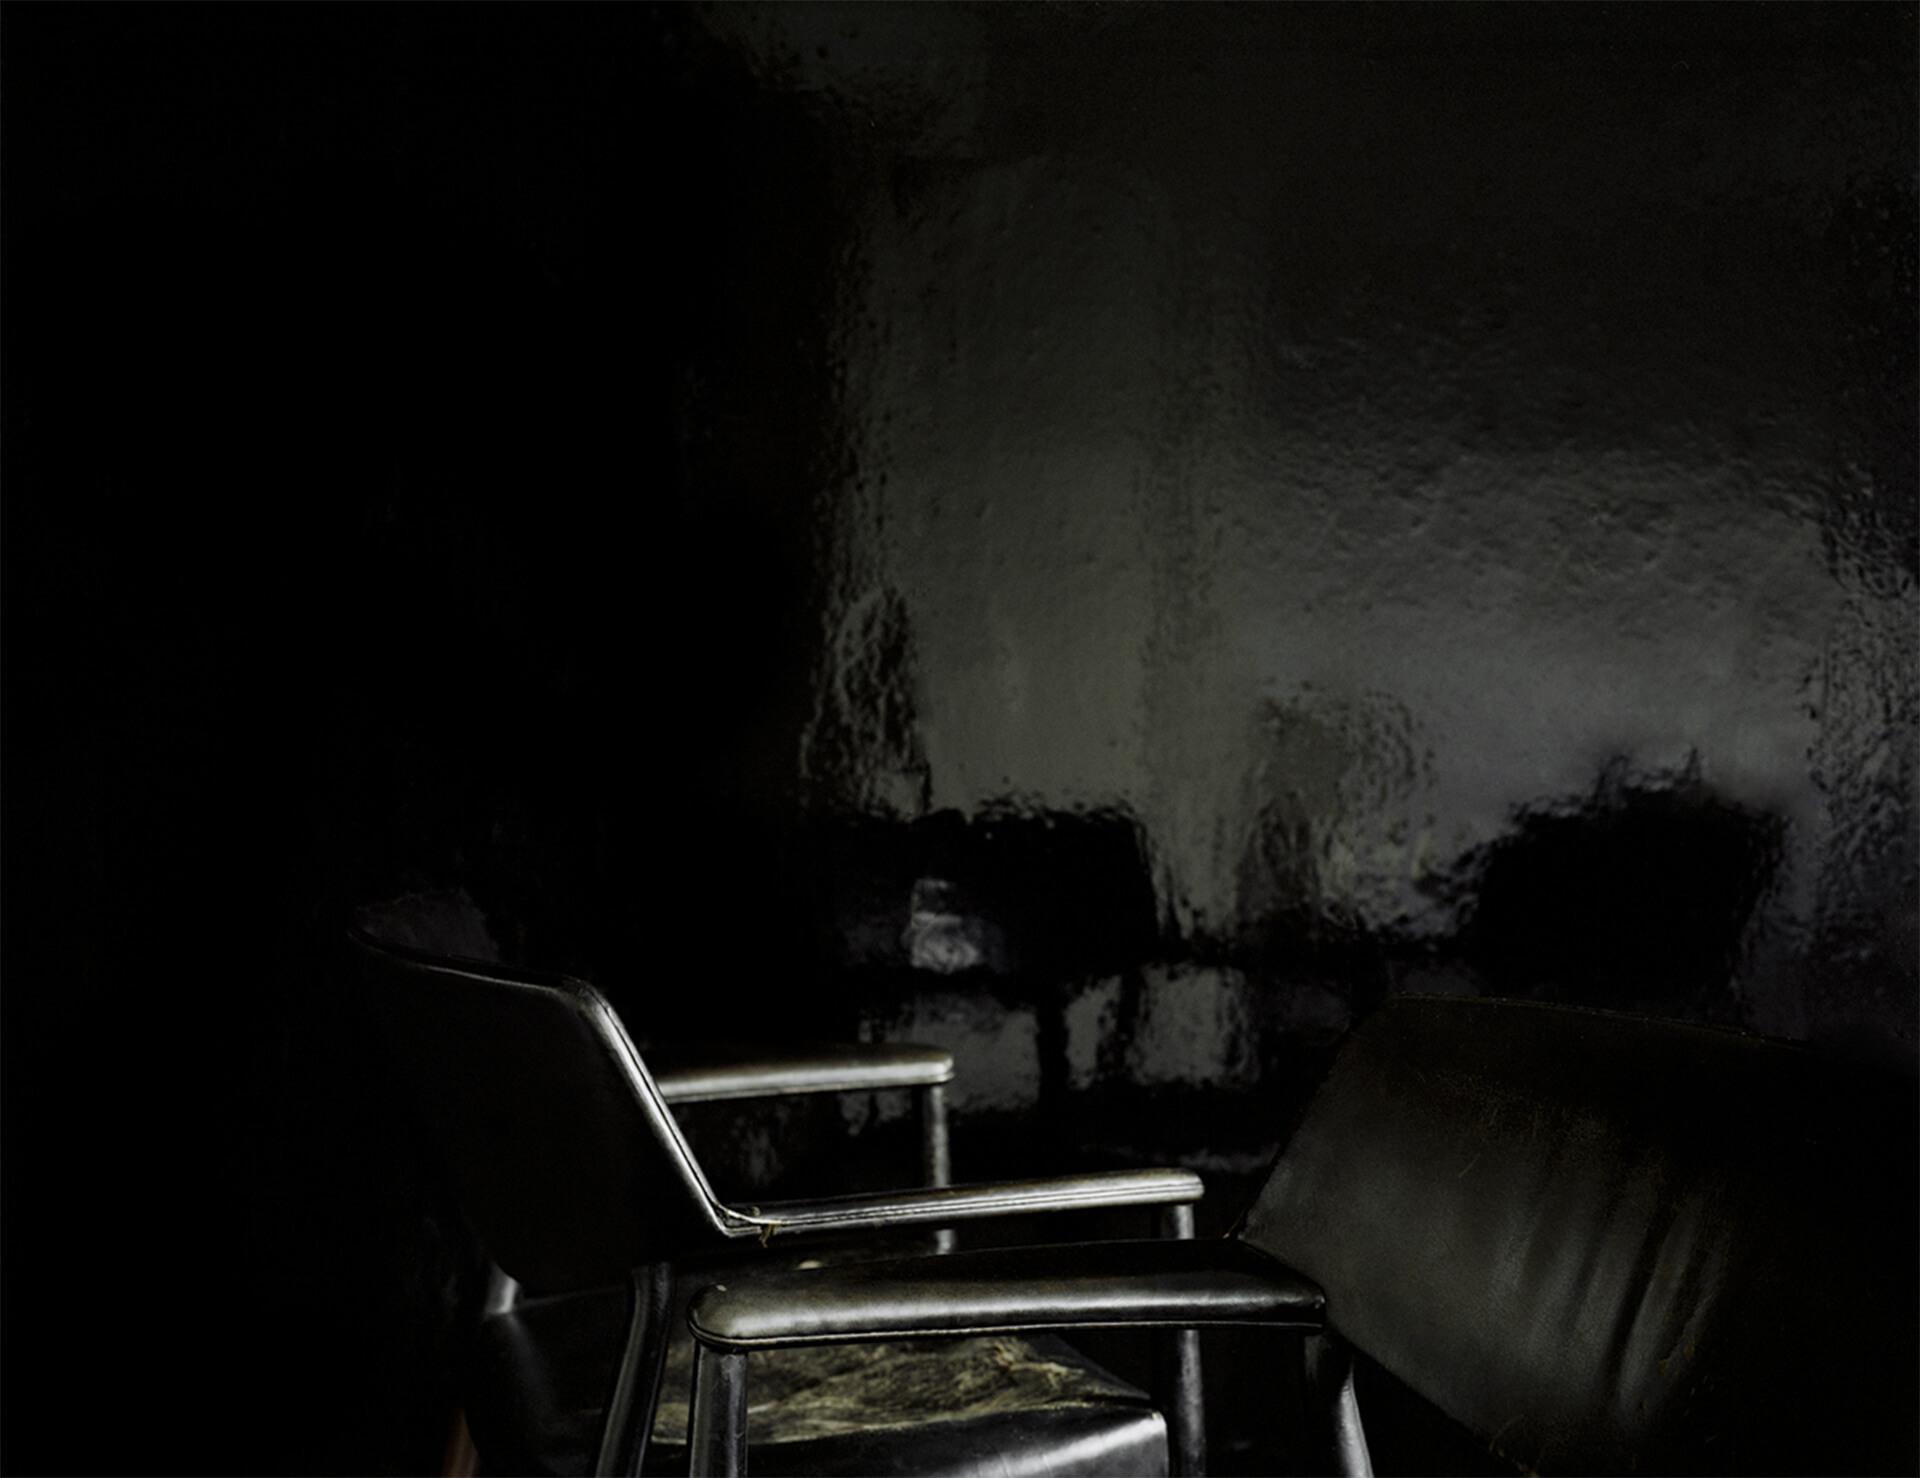 Pernille Koldbech Fich Black Studies Chairs 3